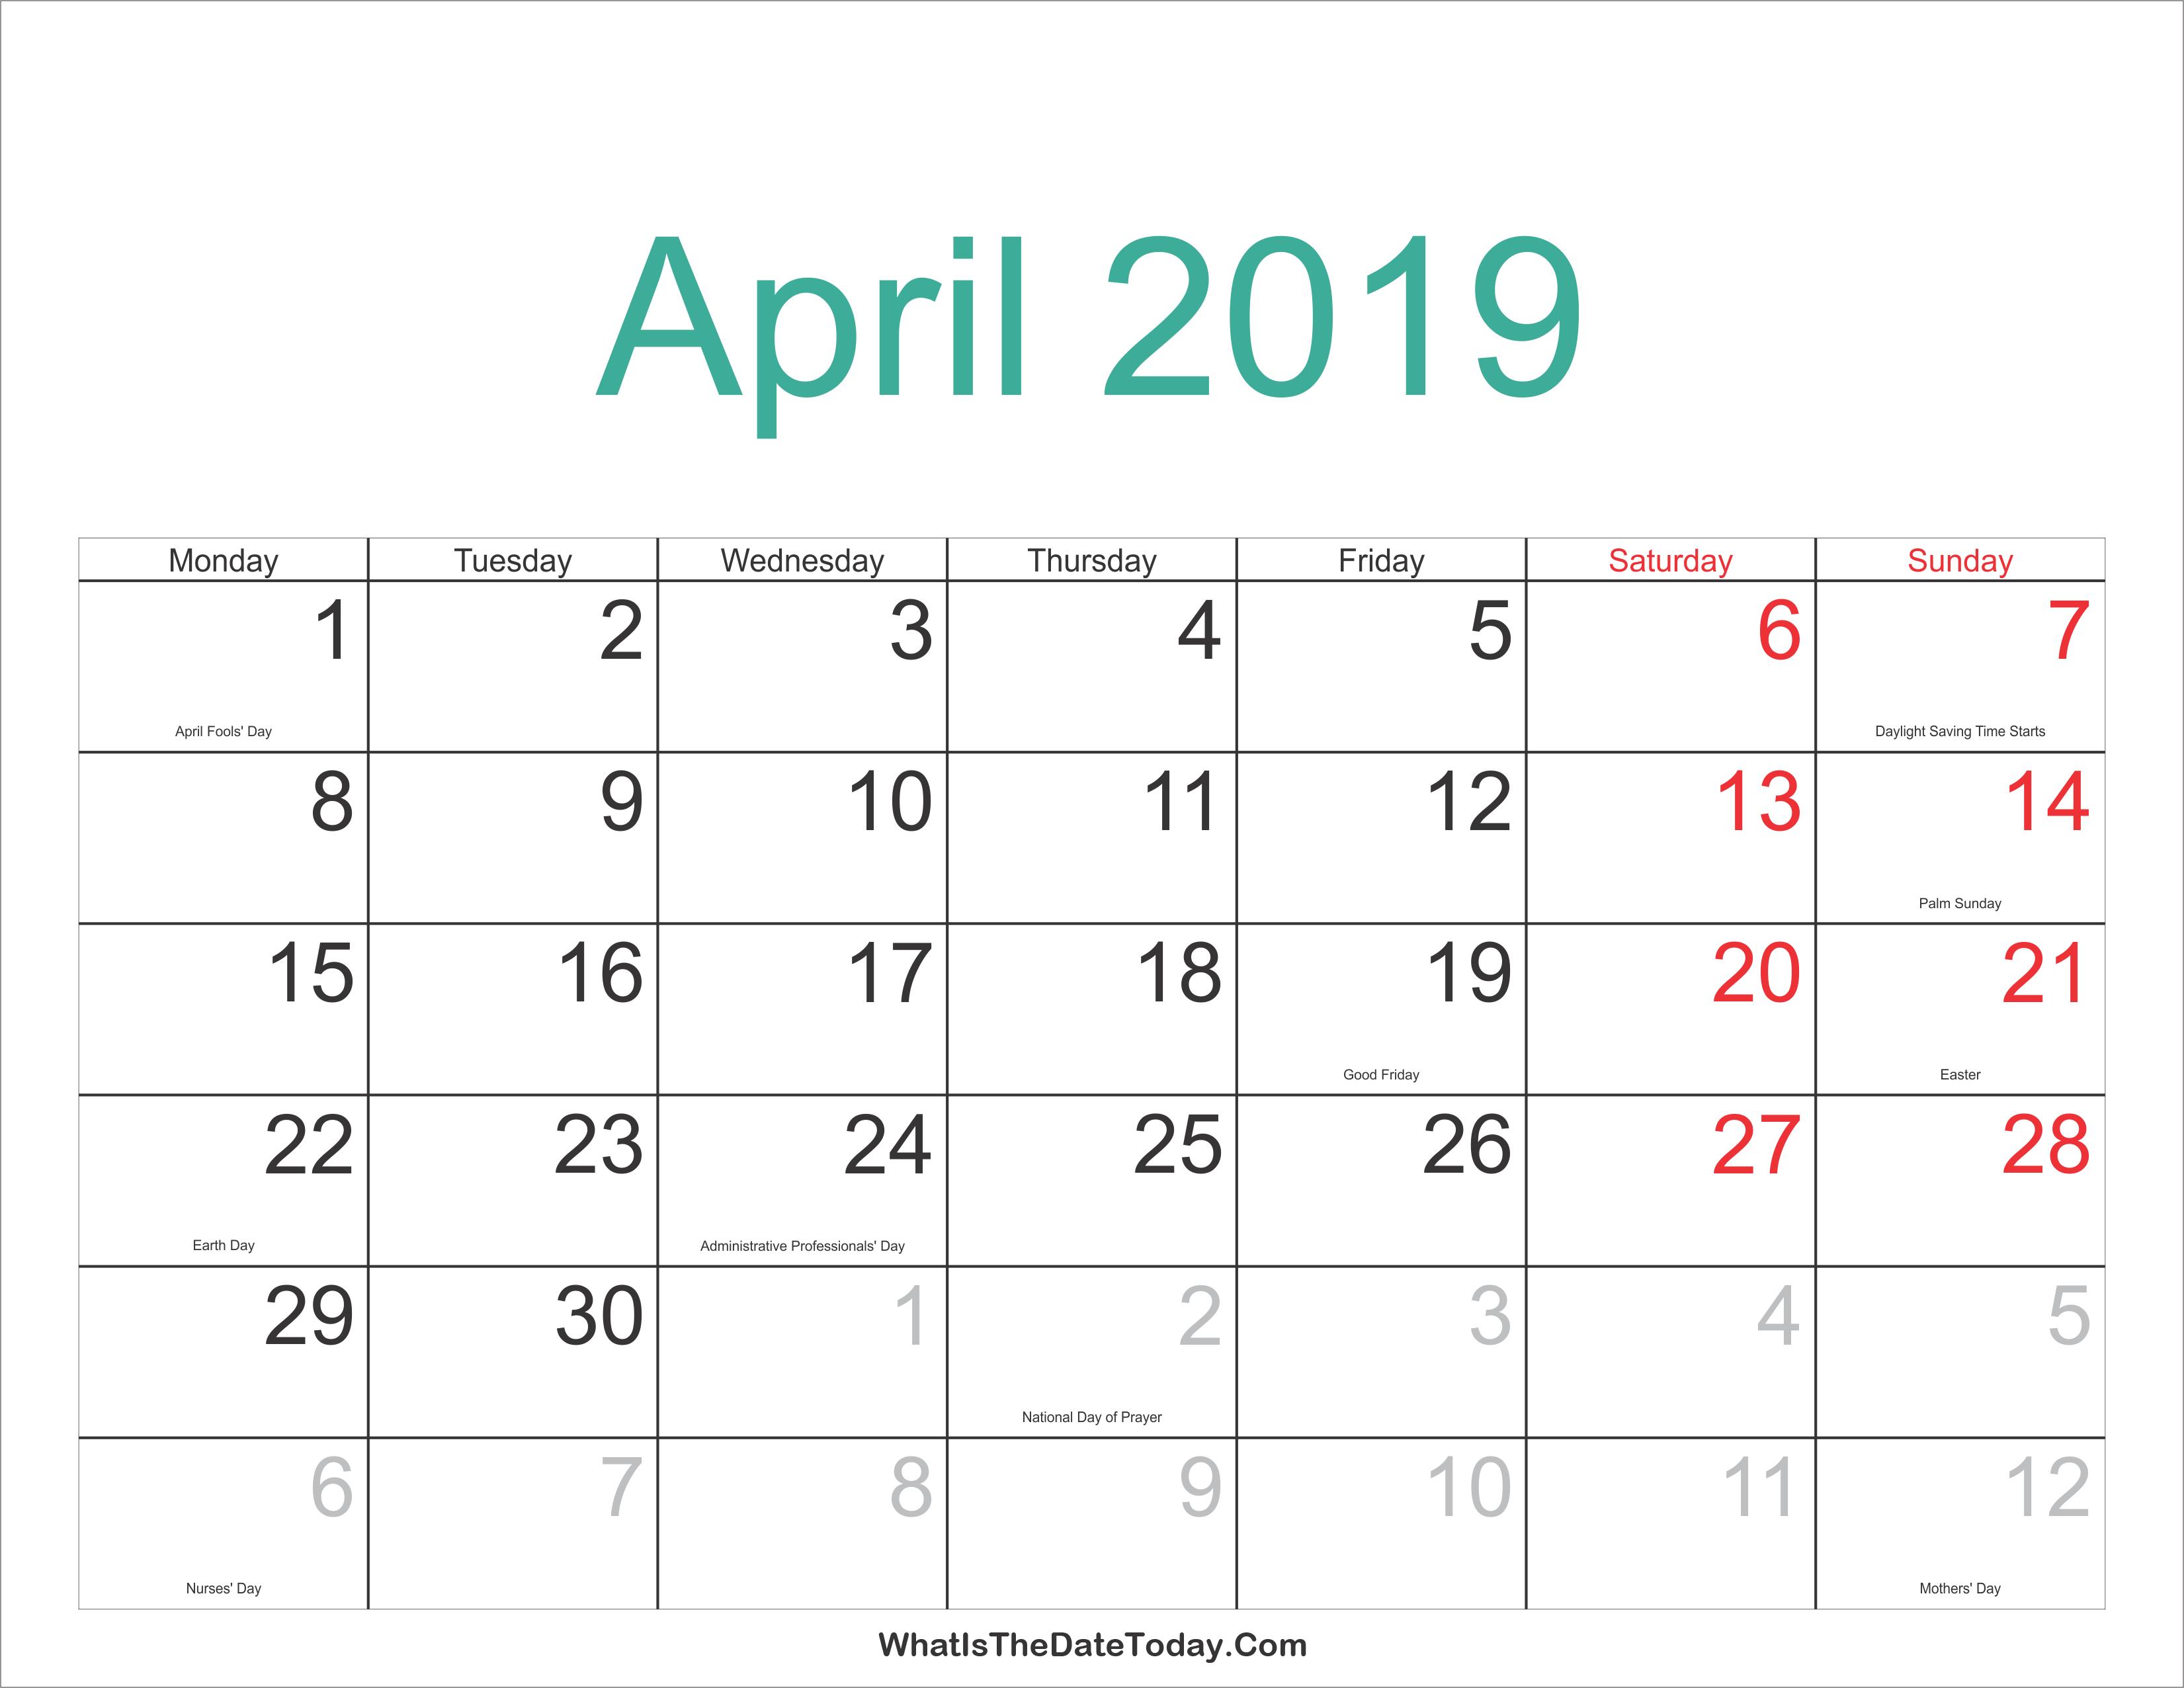 April 2019 Calendar With Holidays Us   April 2019 Calendar Printable Calendar 2019 Easter